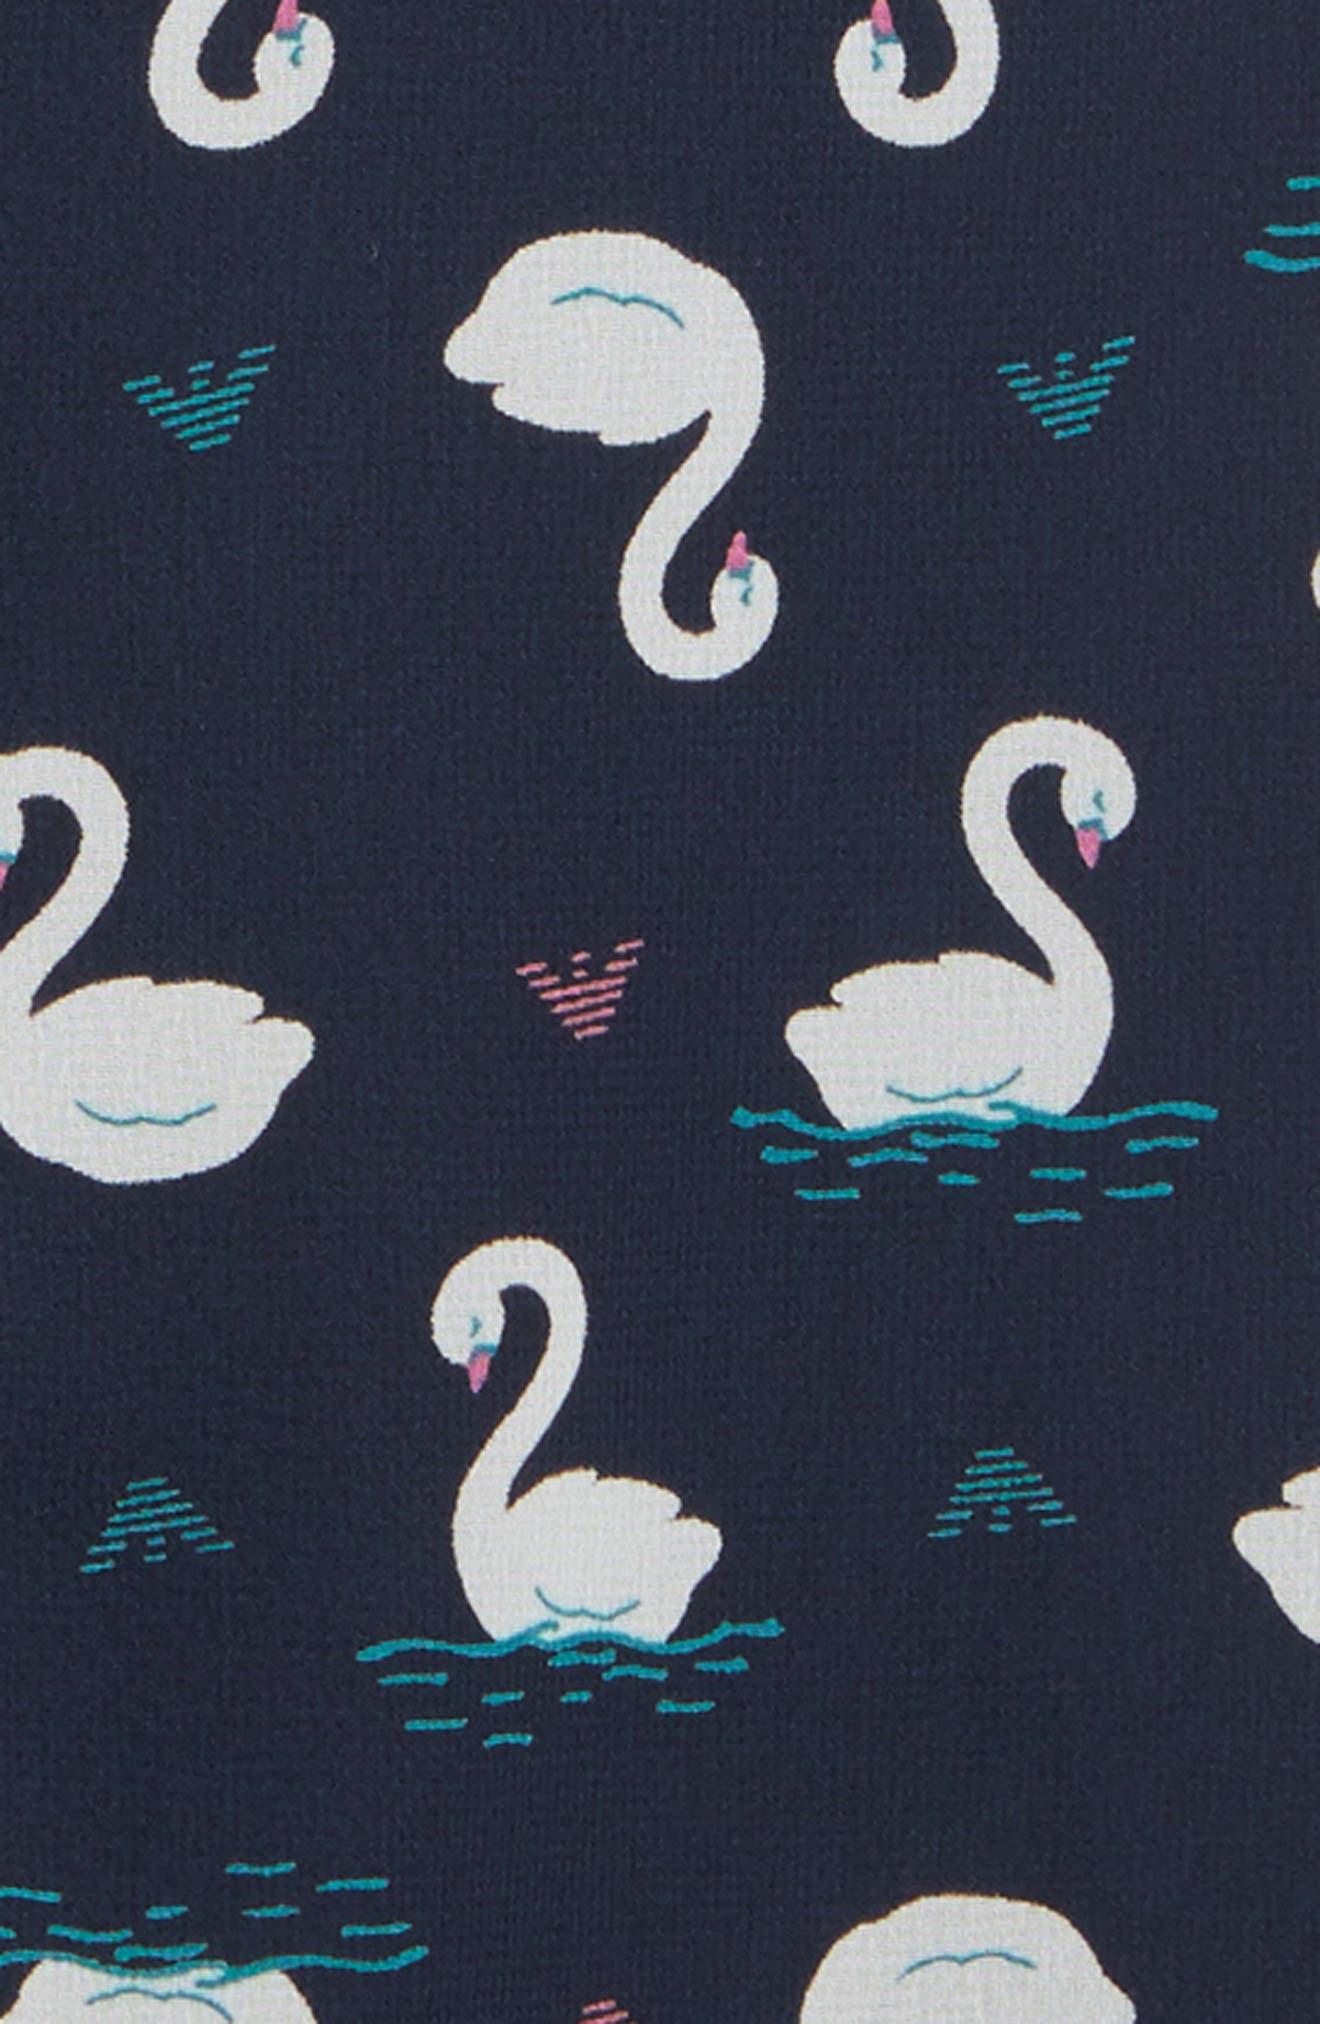 Swan Shift Dress,                             Alternate thumbnail 3, color,                             Navy